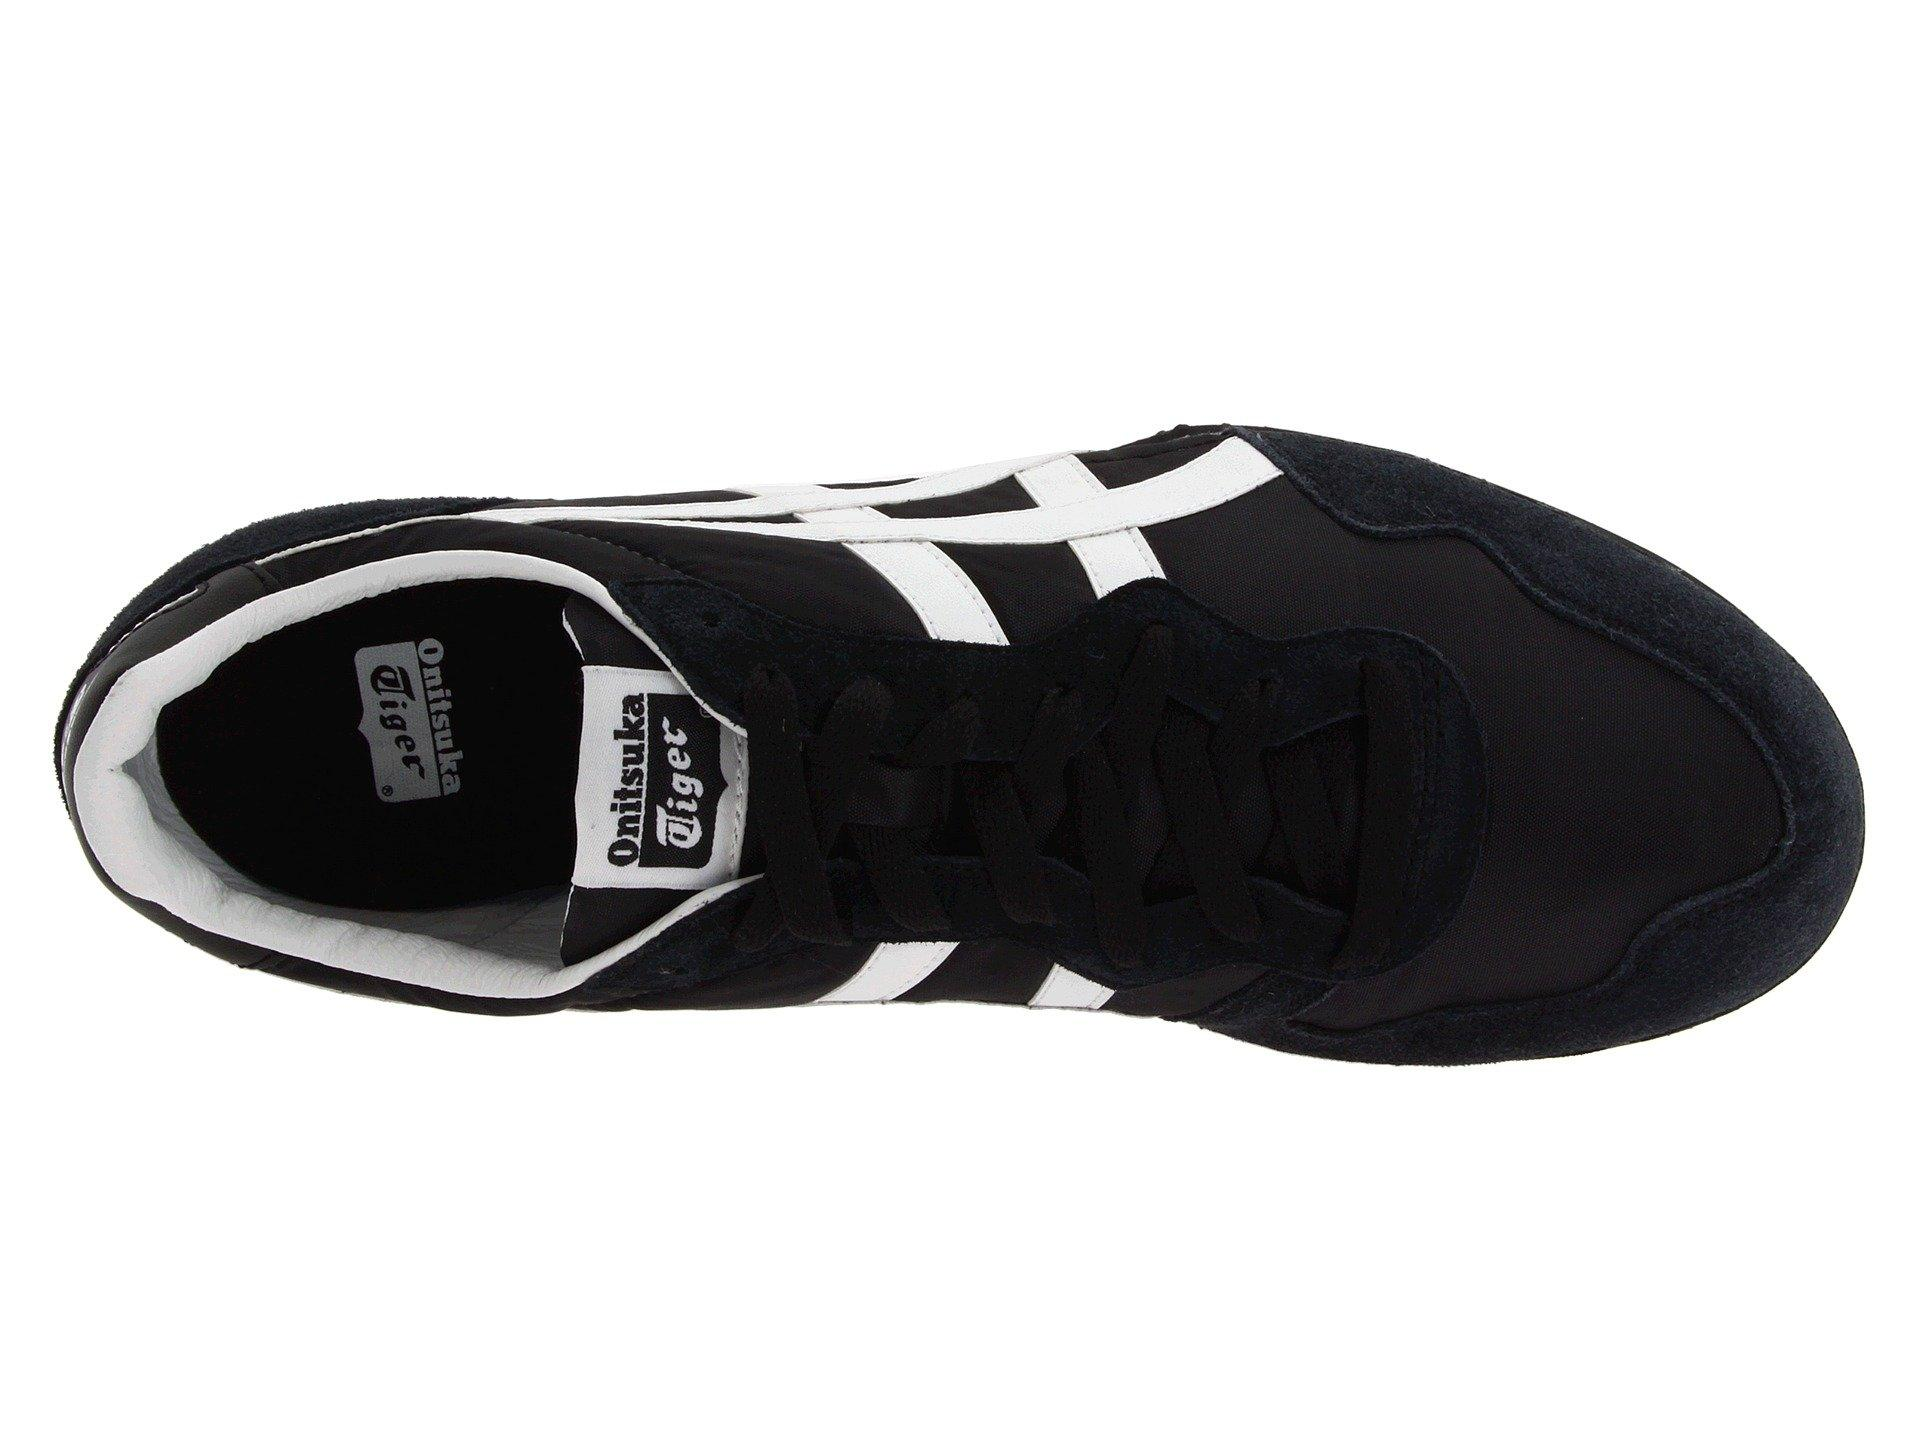 89273500c6a827 Lyst - Onitsuka Tiger Serranotm (vaporous Grey) Classic Shoes in ...